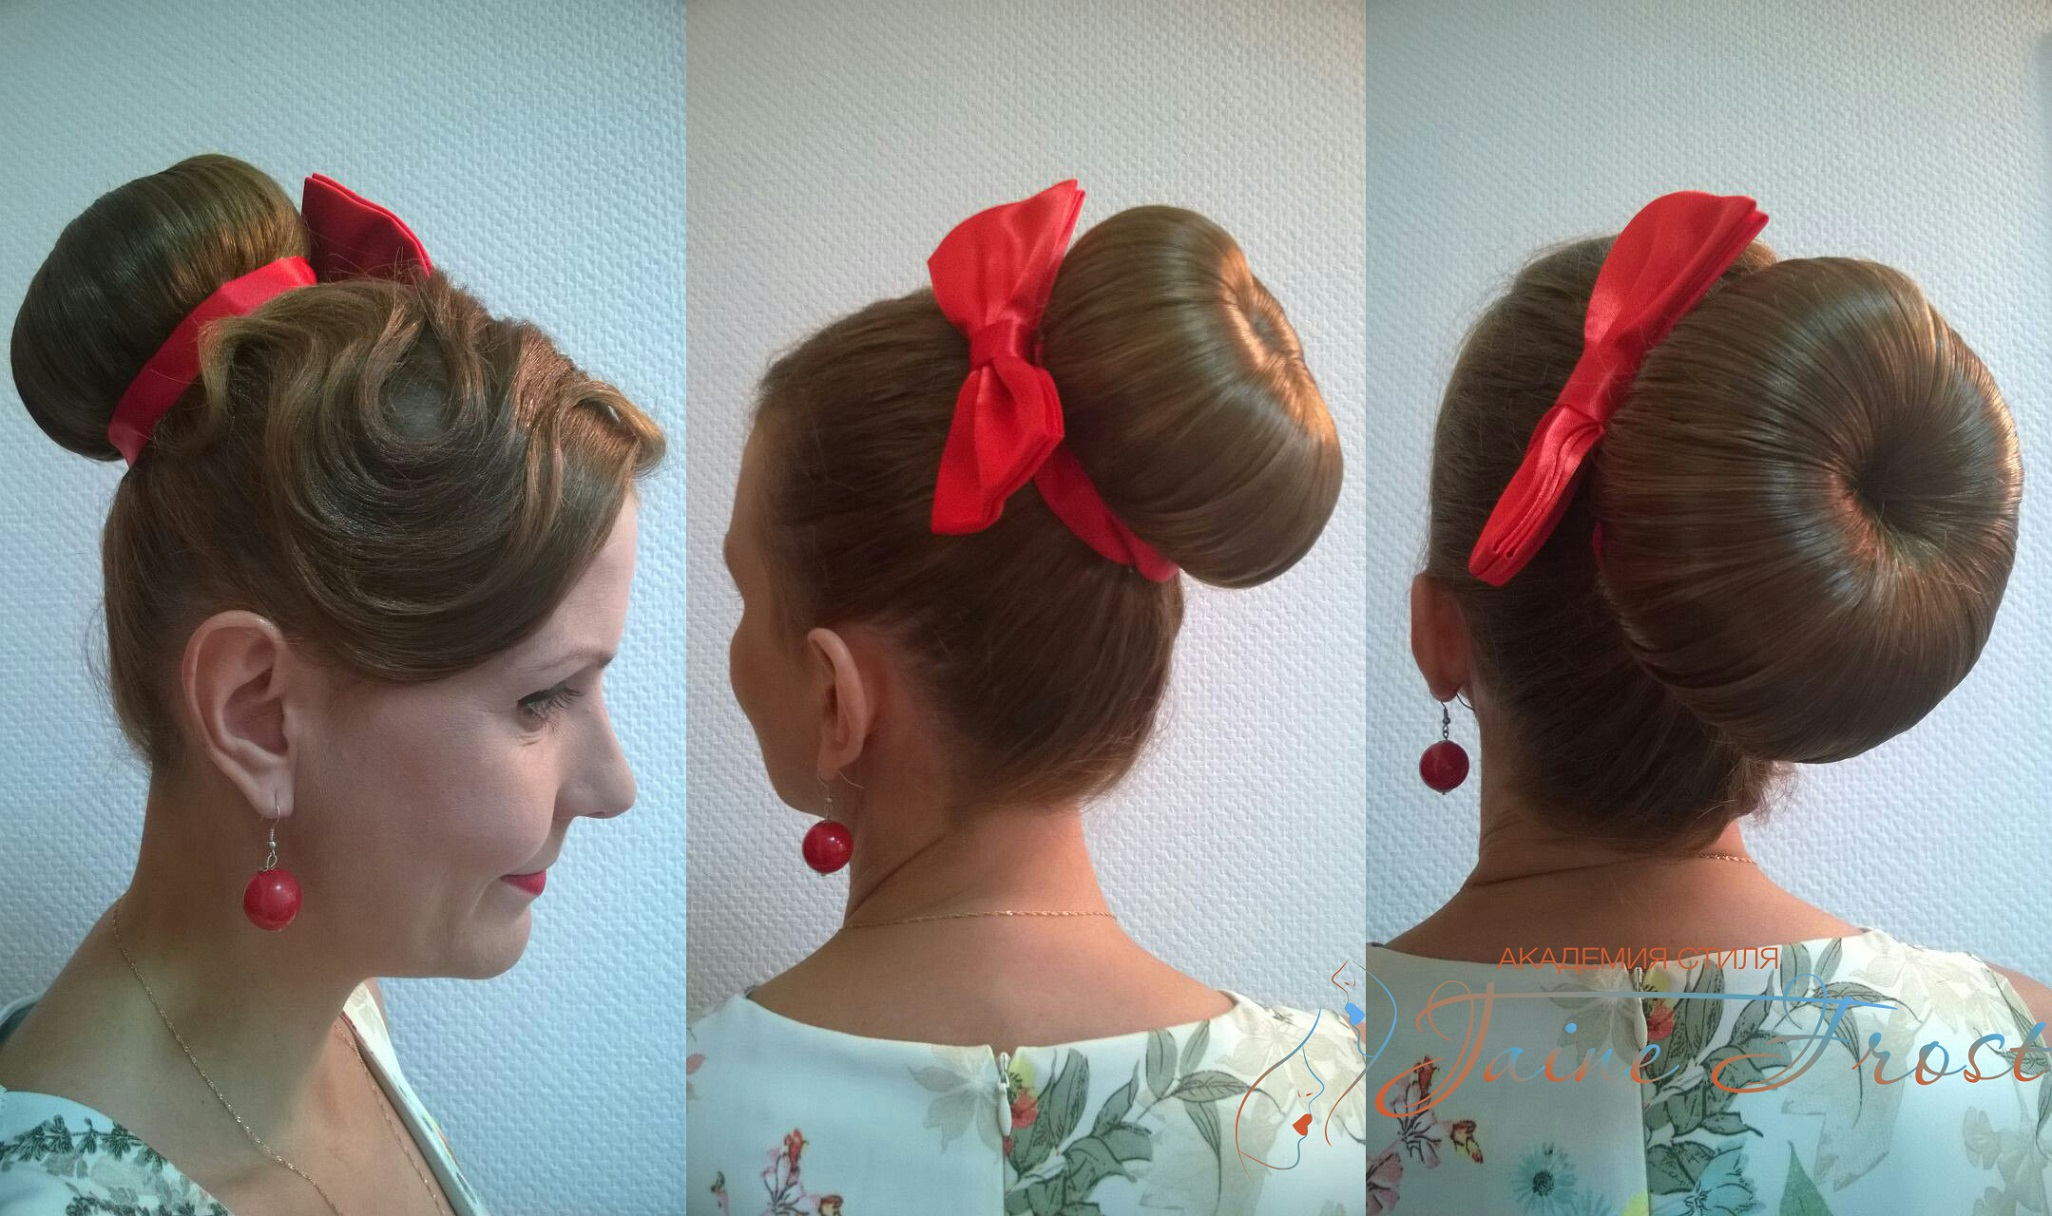 Женская прическа в стиле стиляг фото